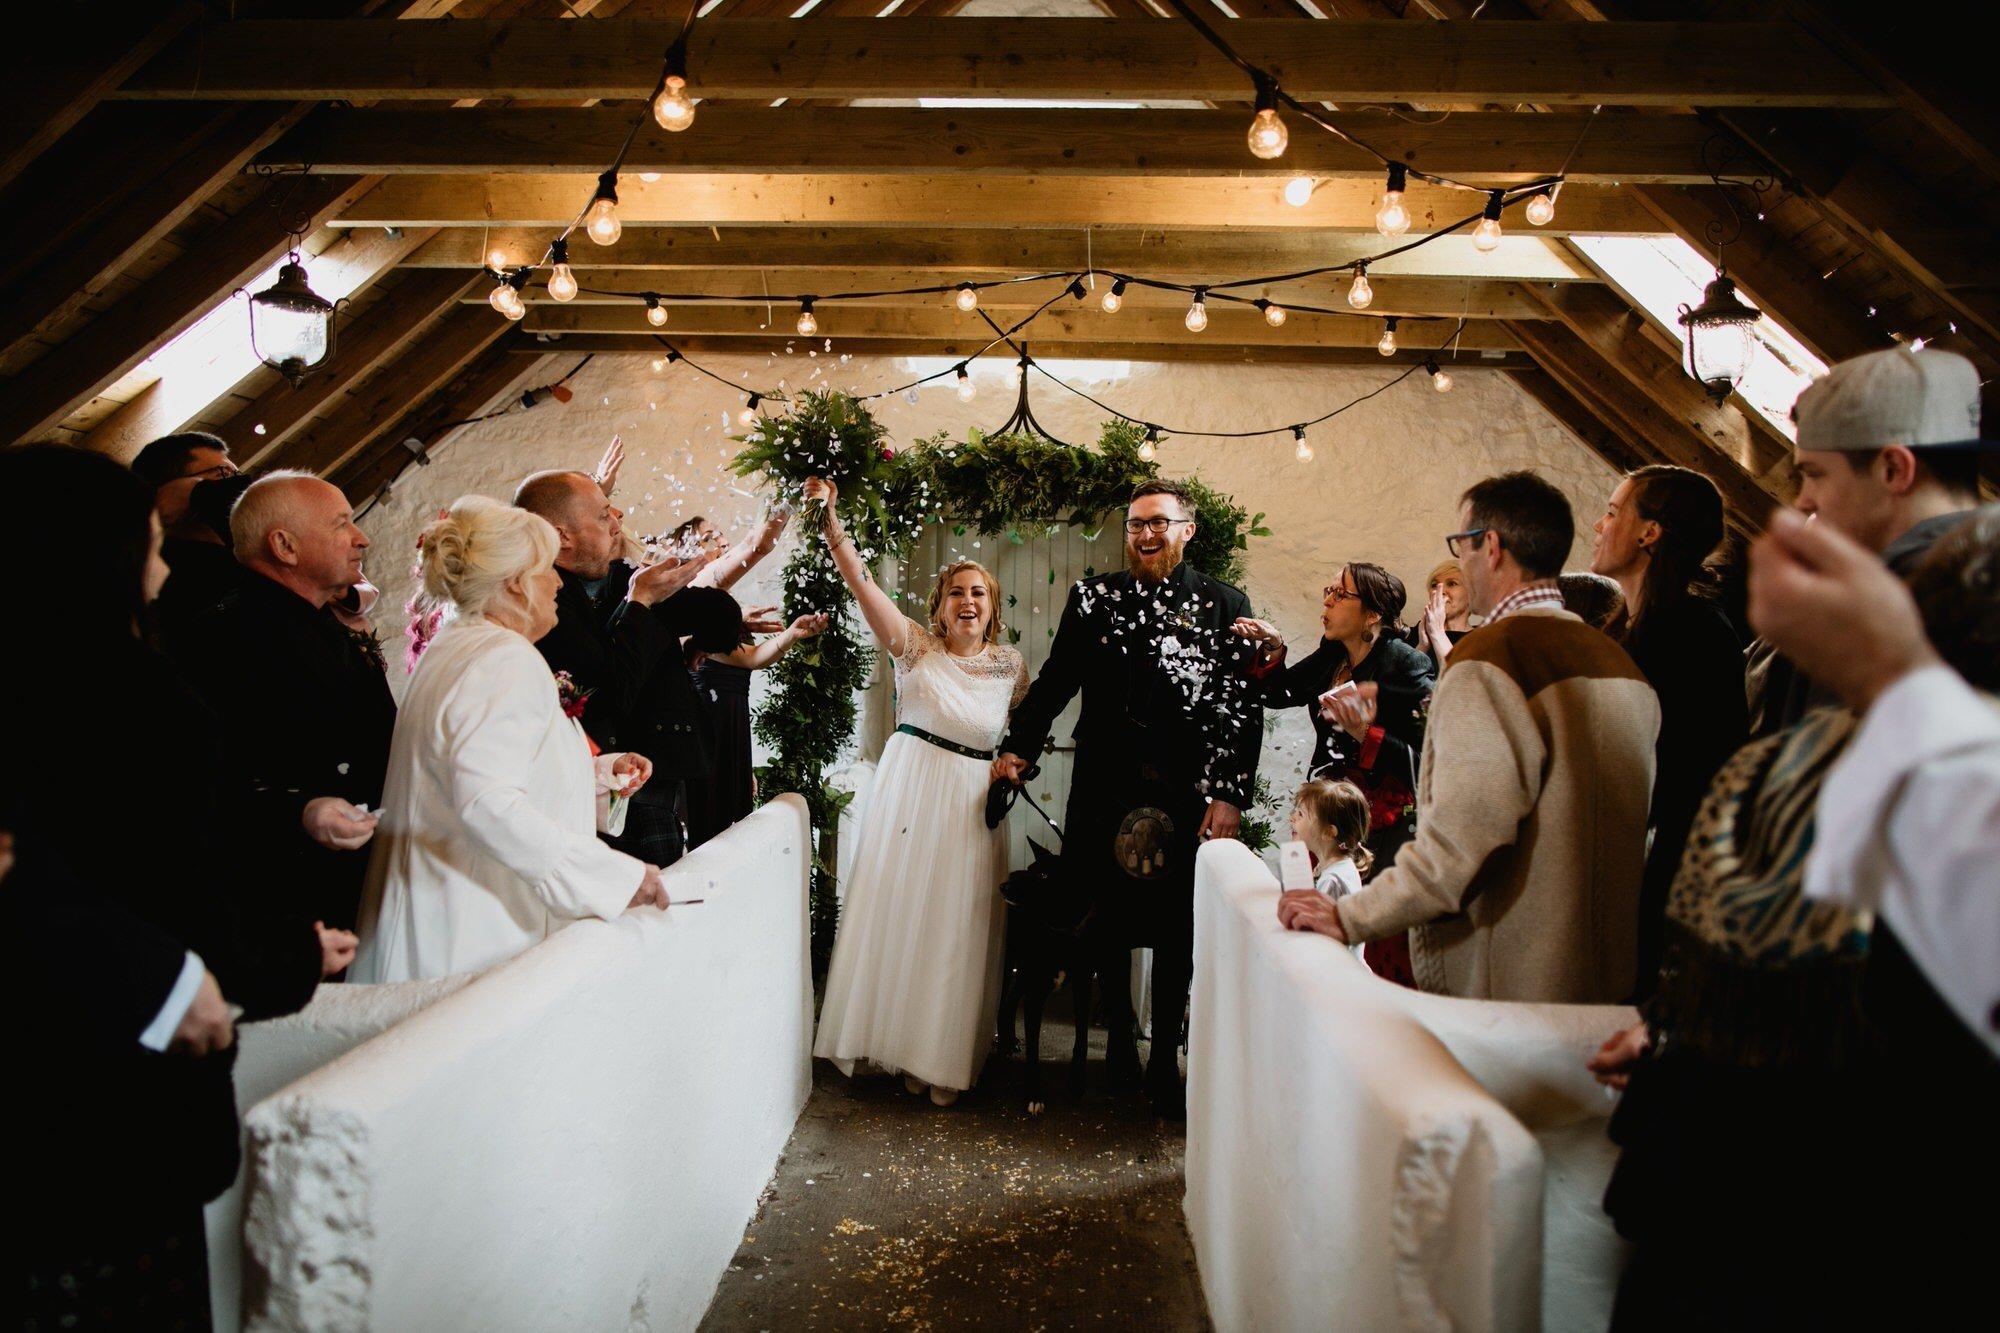 027 TIN SHED KNOCKRAICH WEDDING AUSTRIAN SCOTTISH ZOE ALEXANDRA PHOTOGRAPHY